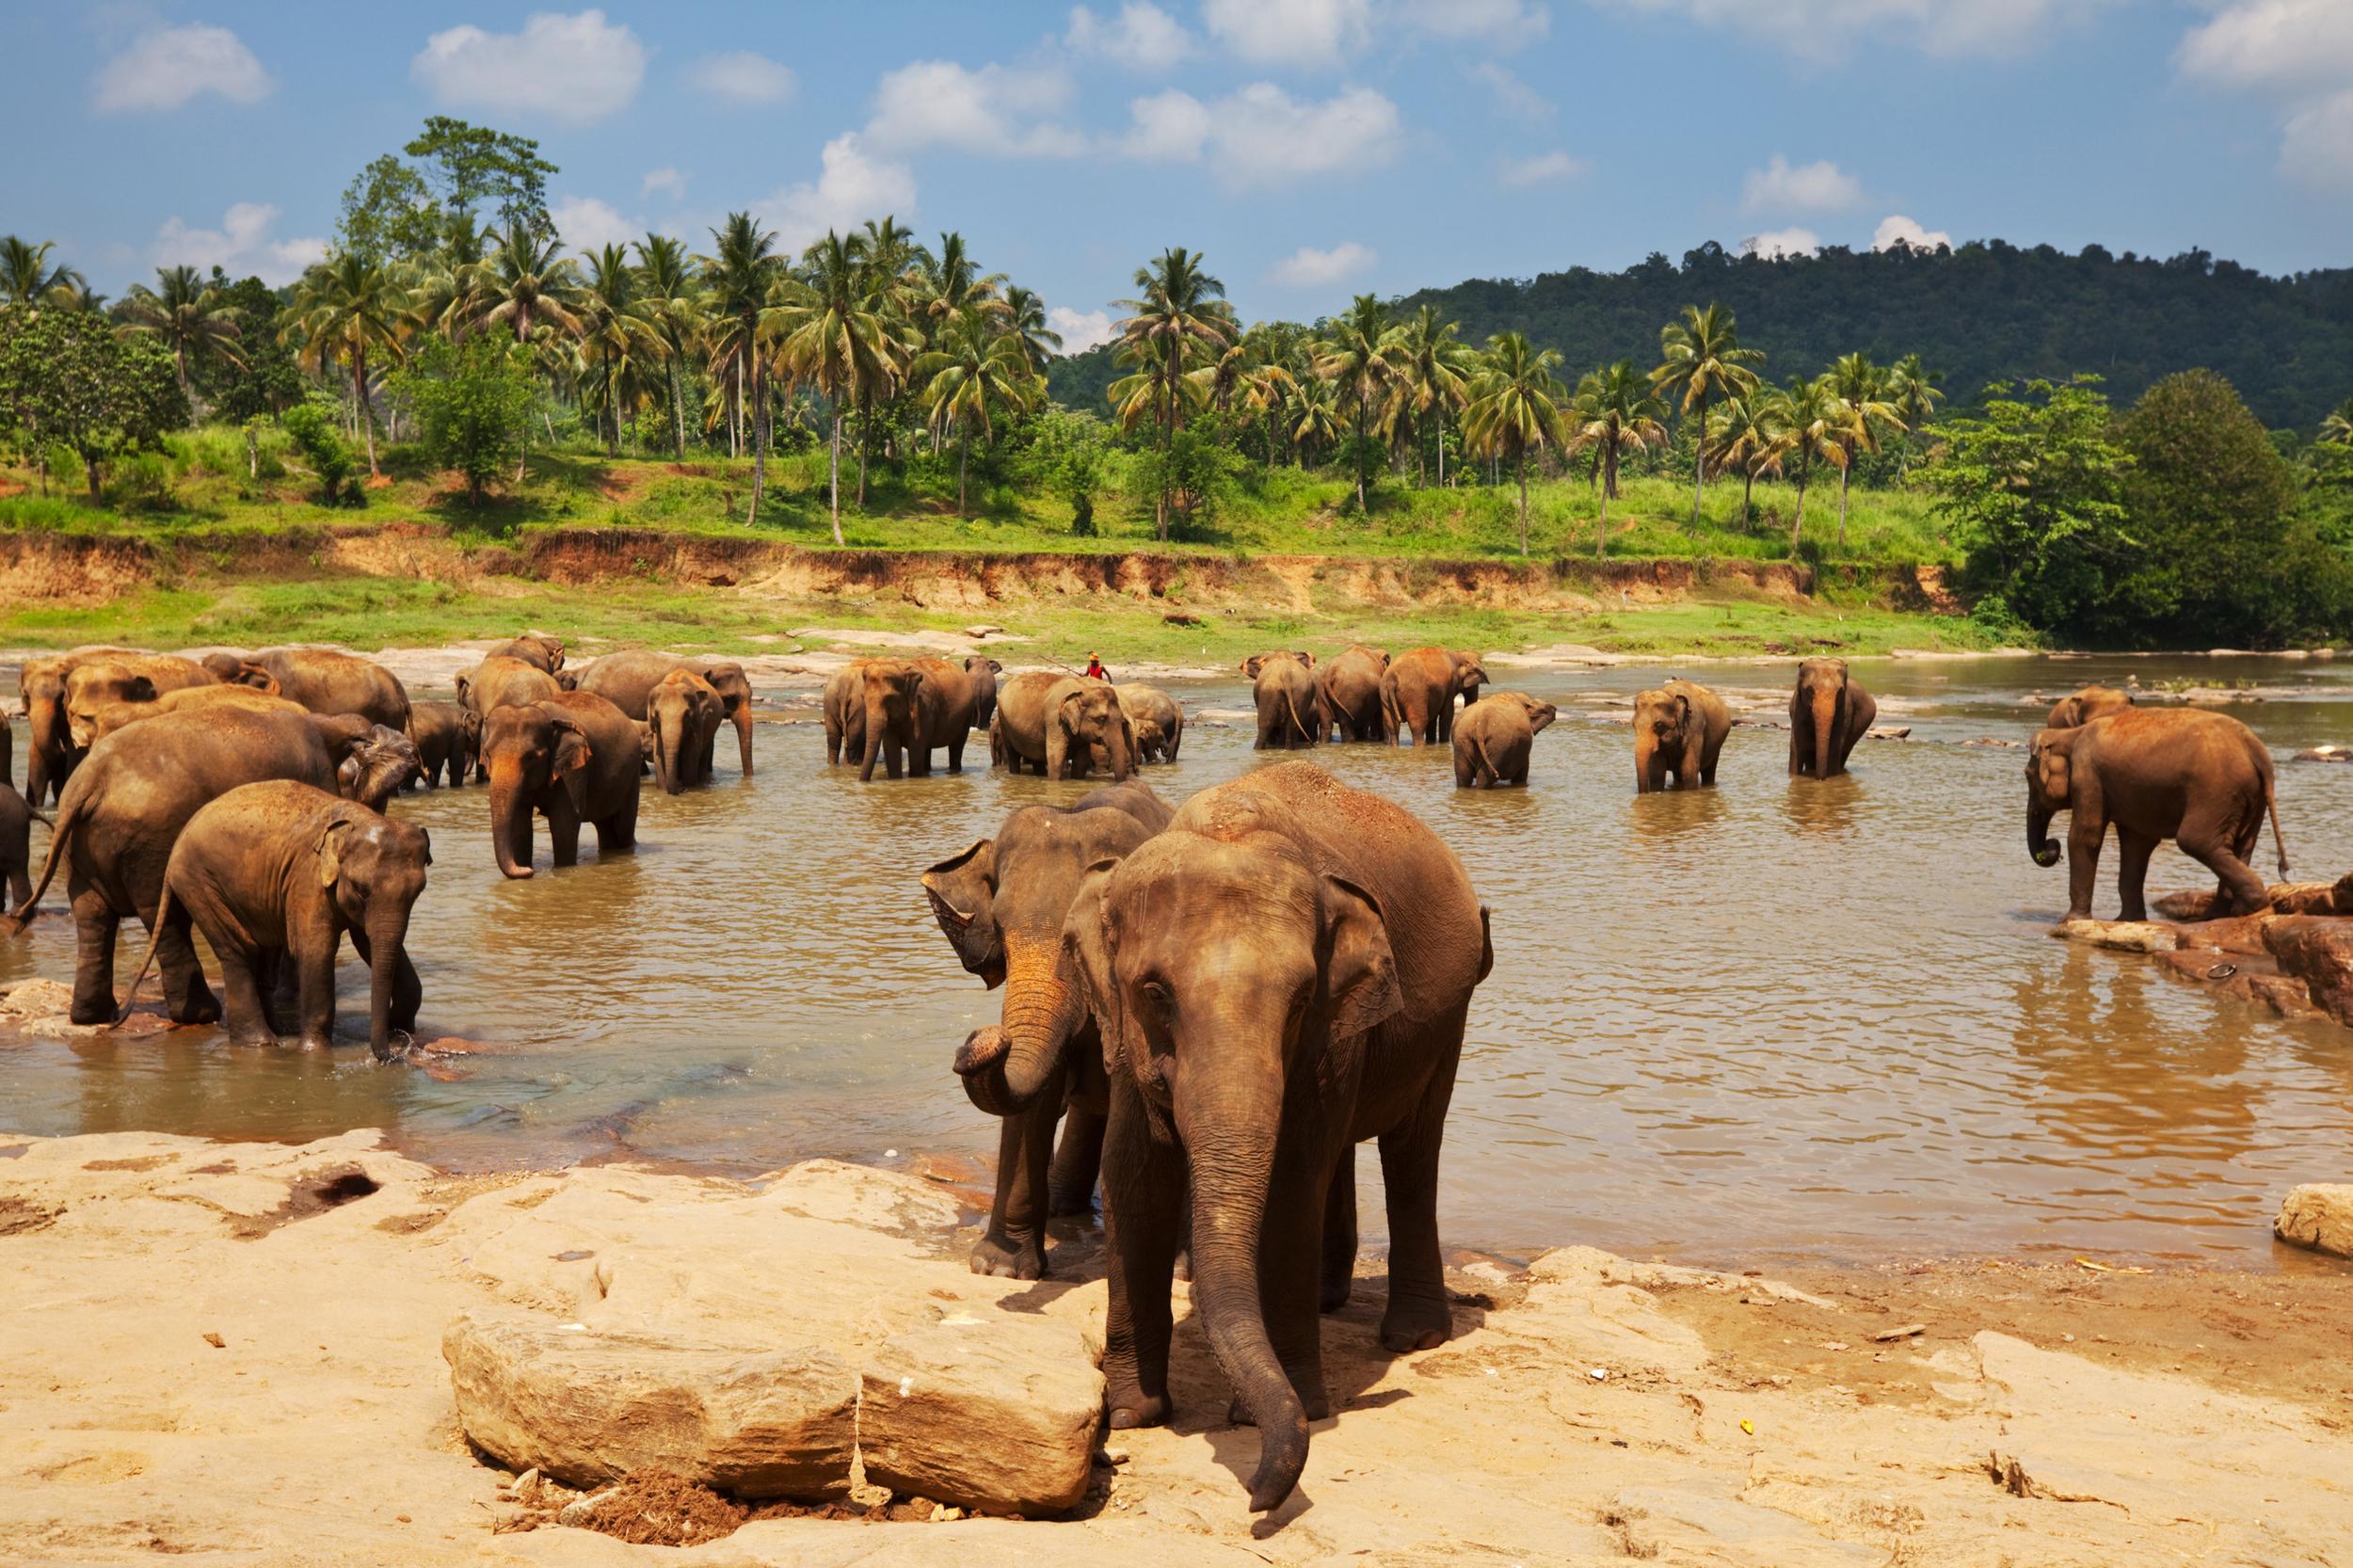 pinnawala-elephant-orphanage-sri-lanka-invite-to-paradise.jpg